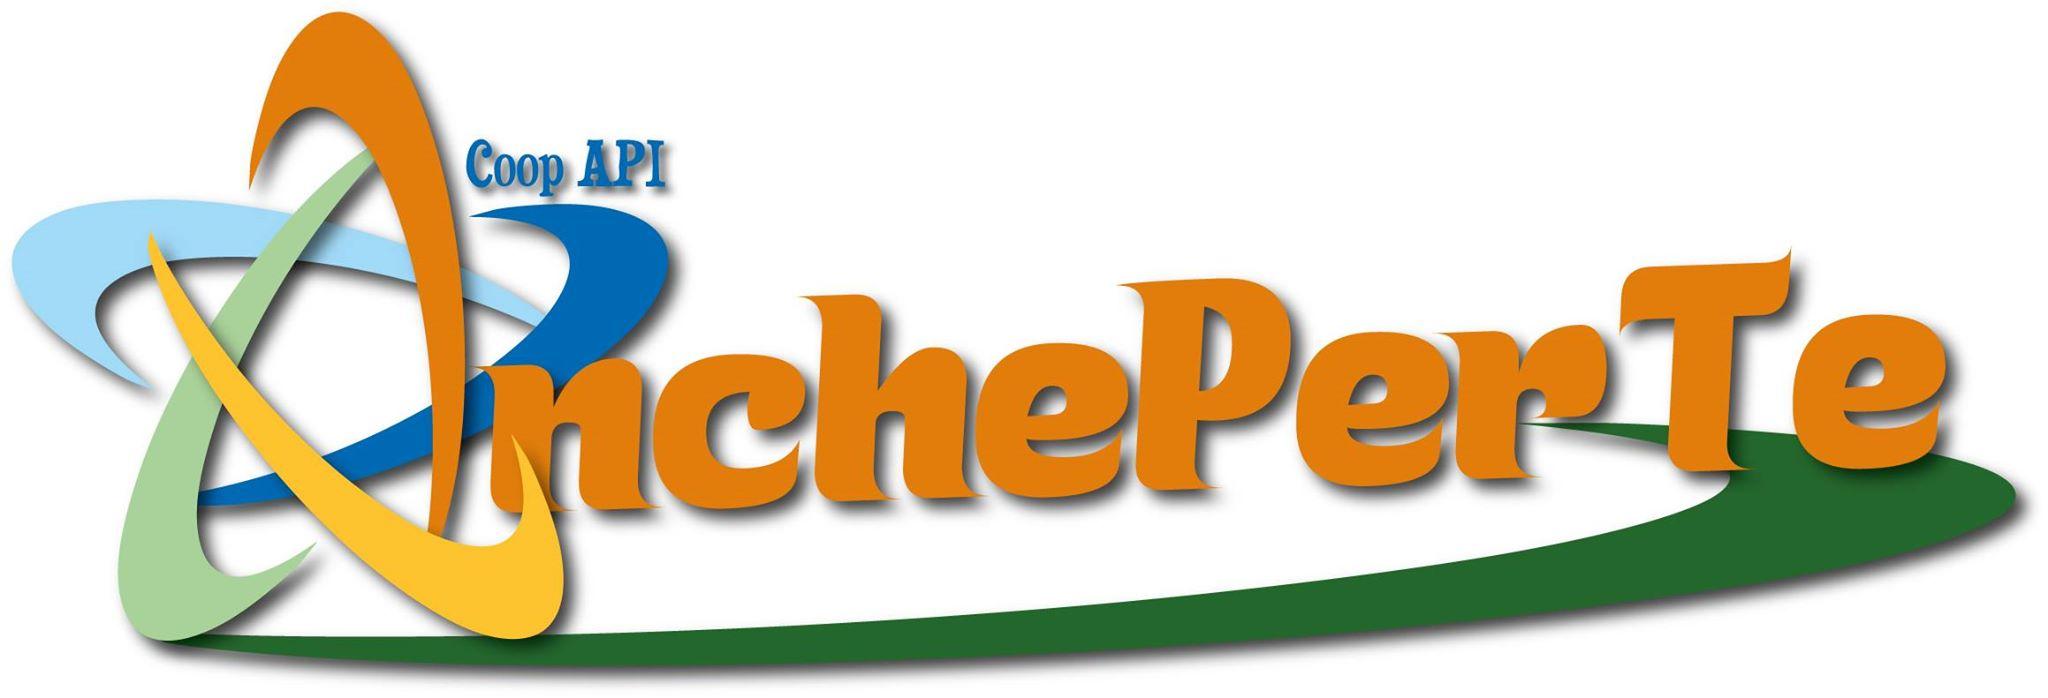 Coop.Api – Progetto AnchePerTe –  Partner ItaliAccessibile